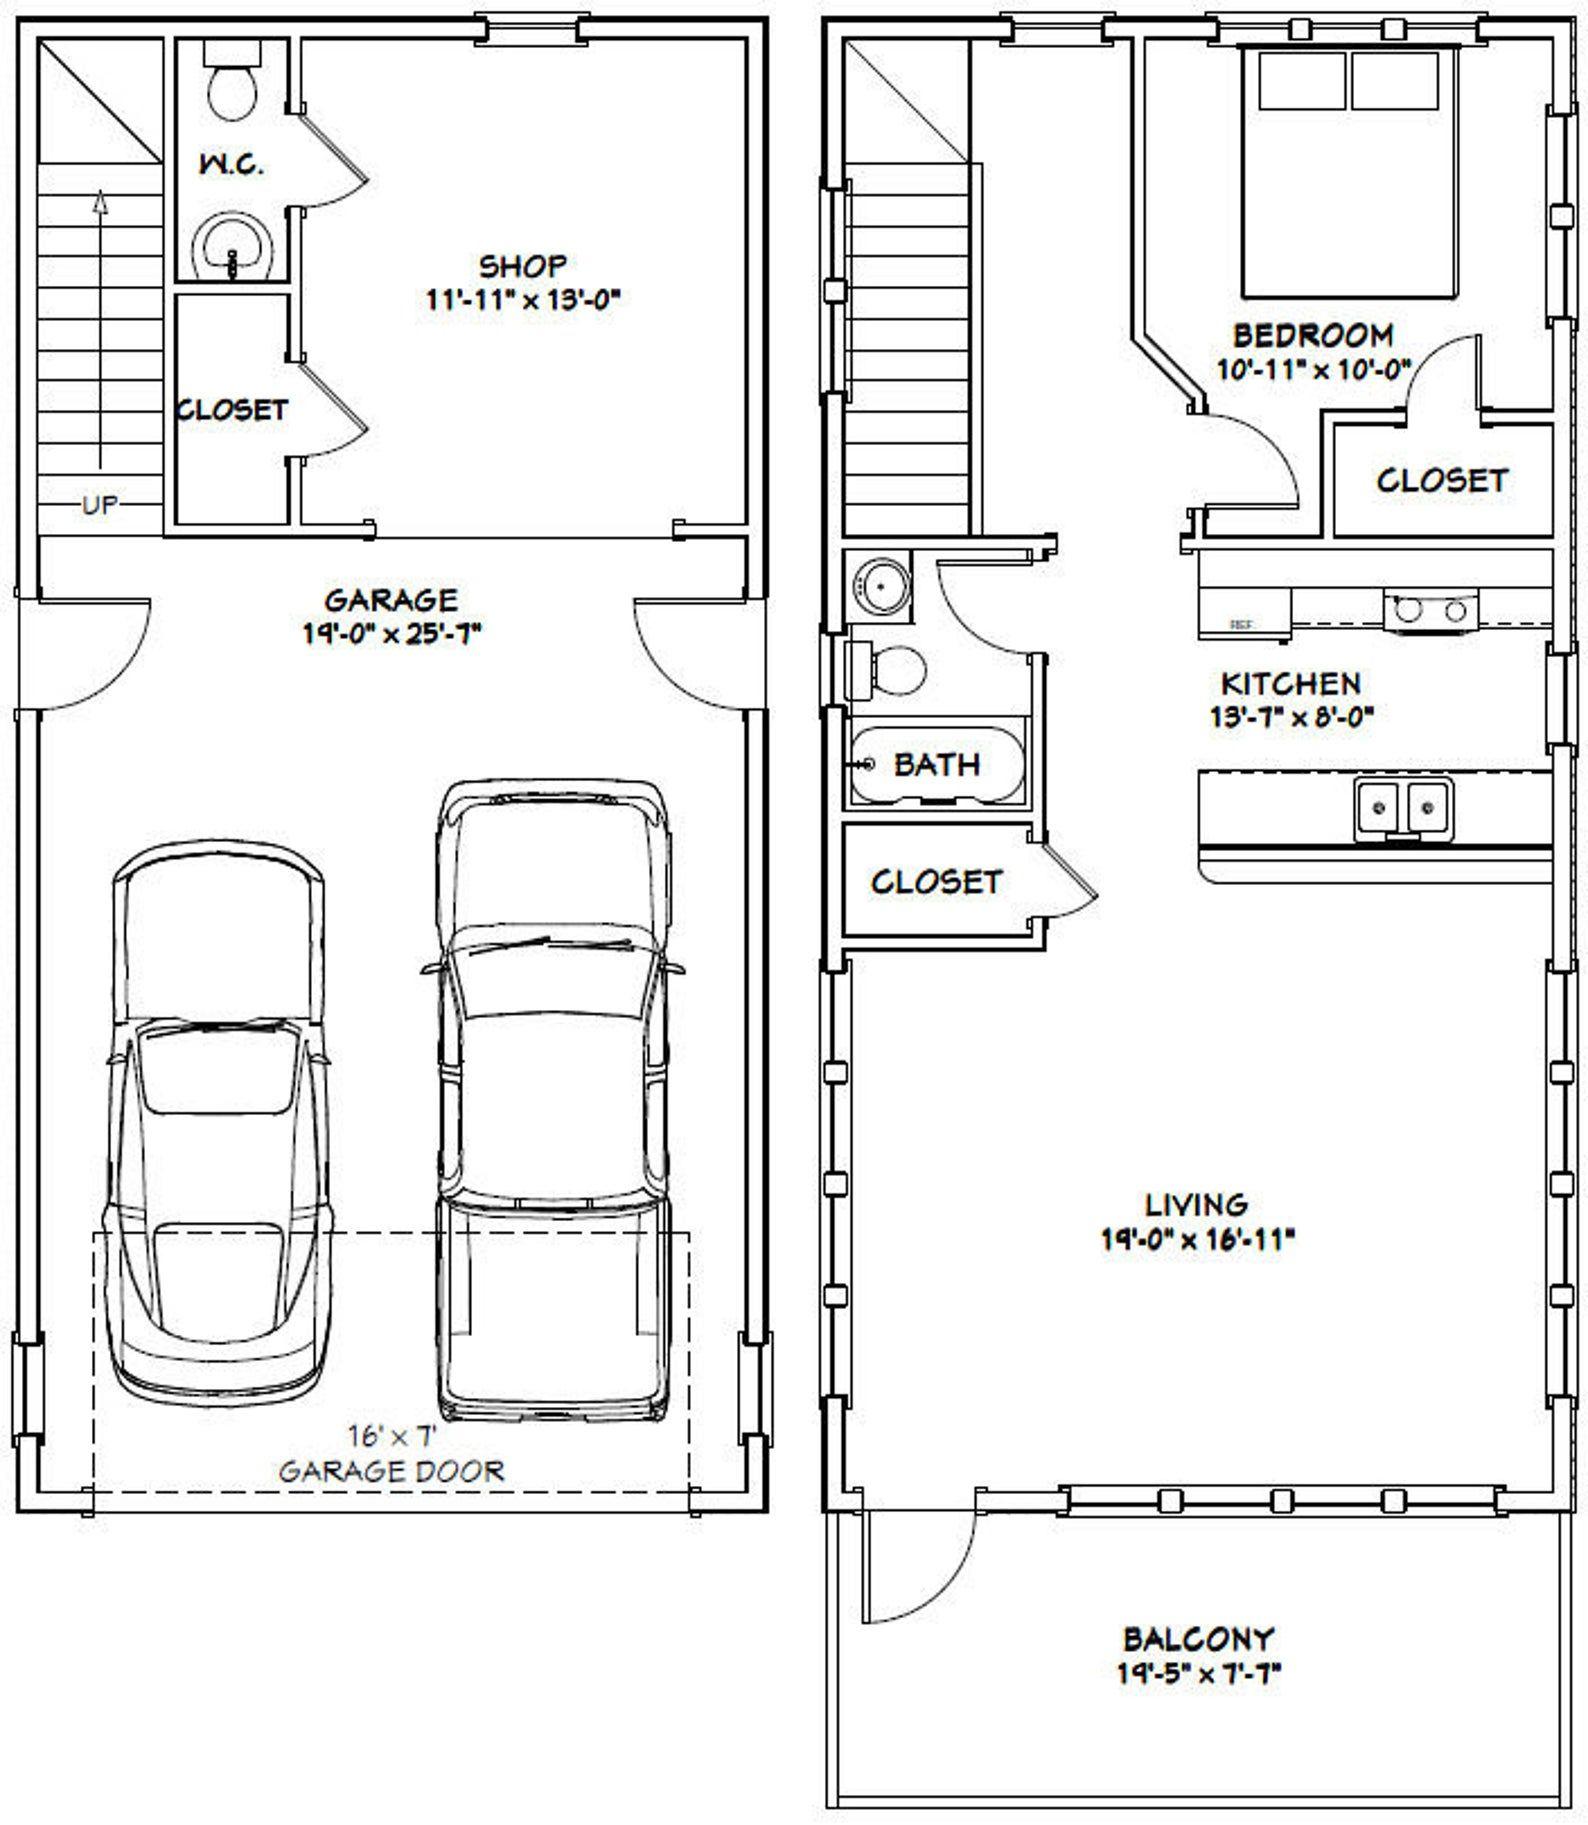 20x40 House 1Bedroom 1.5Bath 965 sq ft PDF